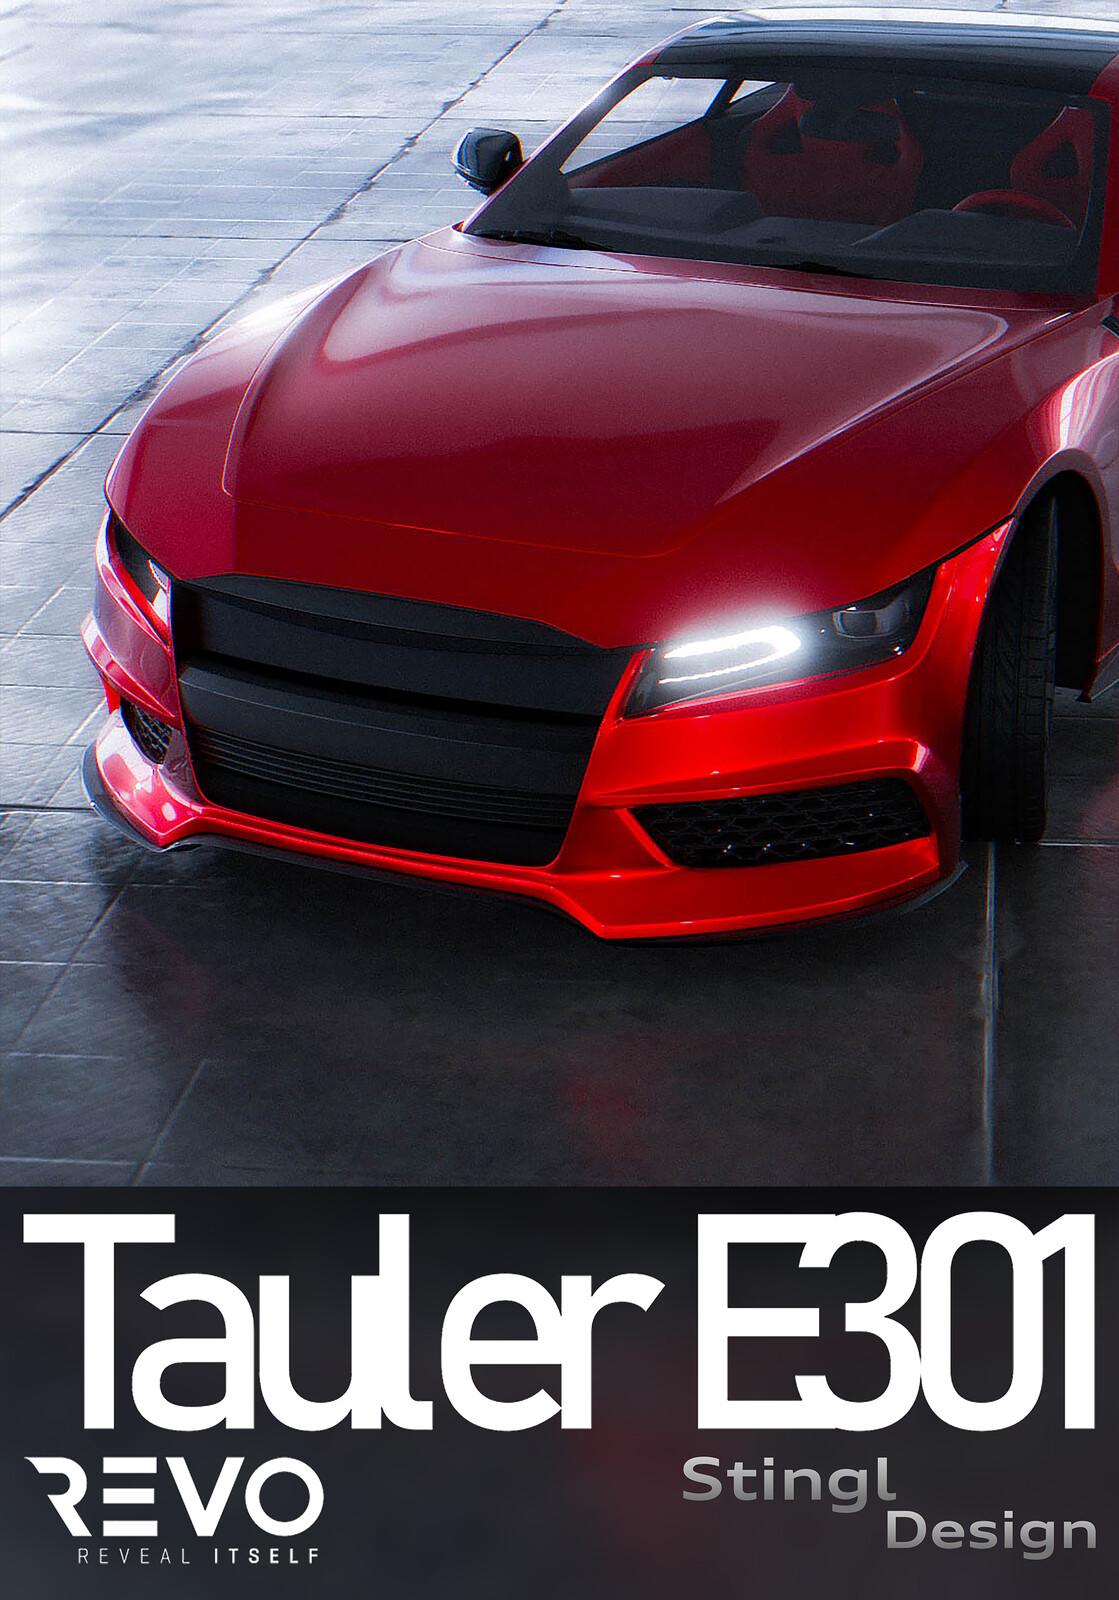 Tauler E301